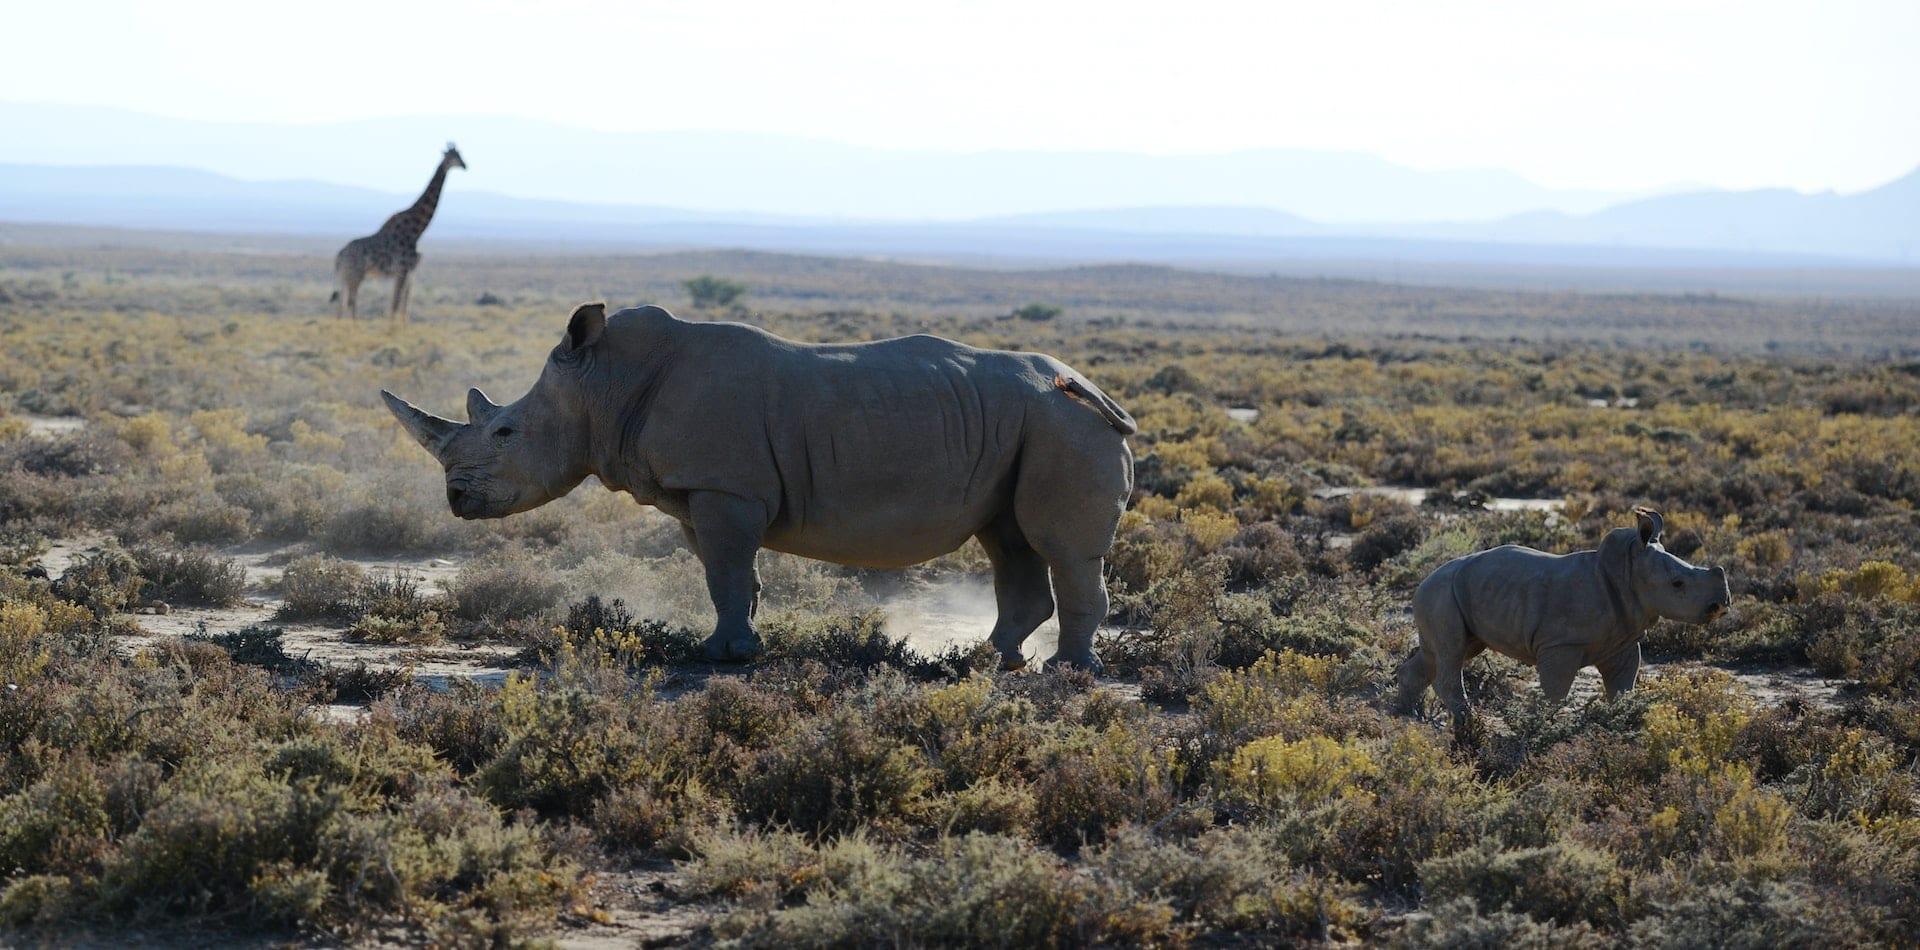 rhino and baby, featuring giraffe in background